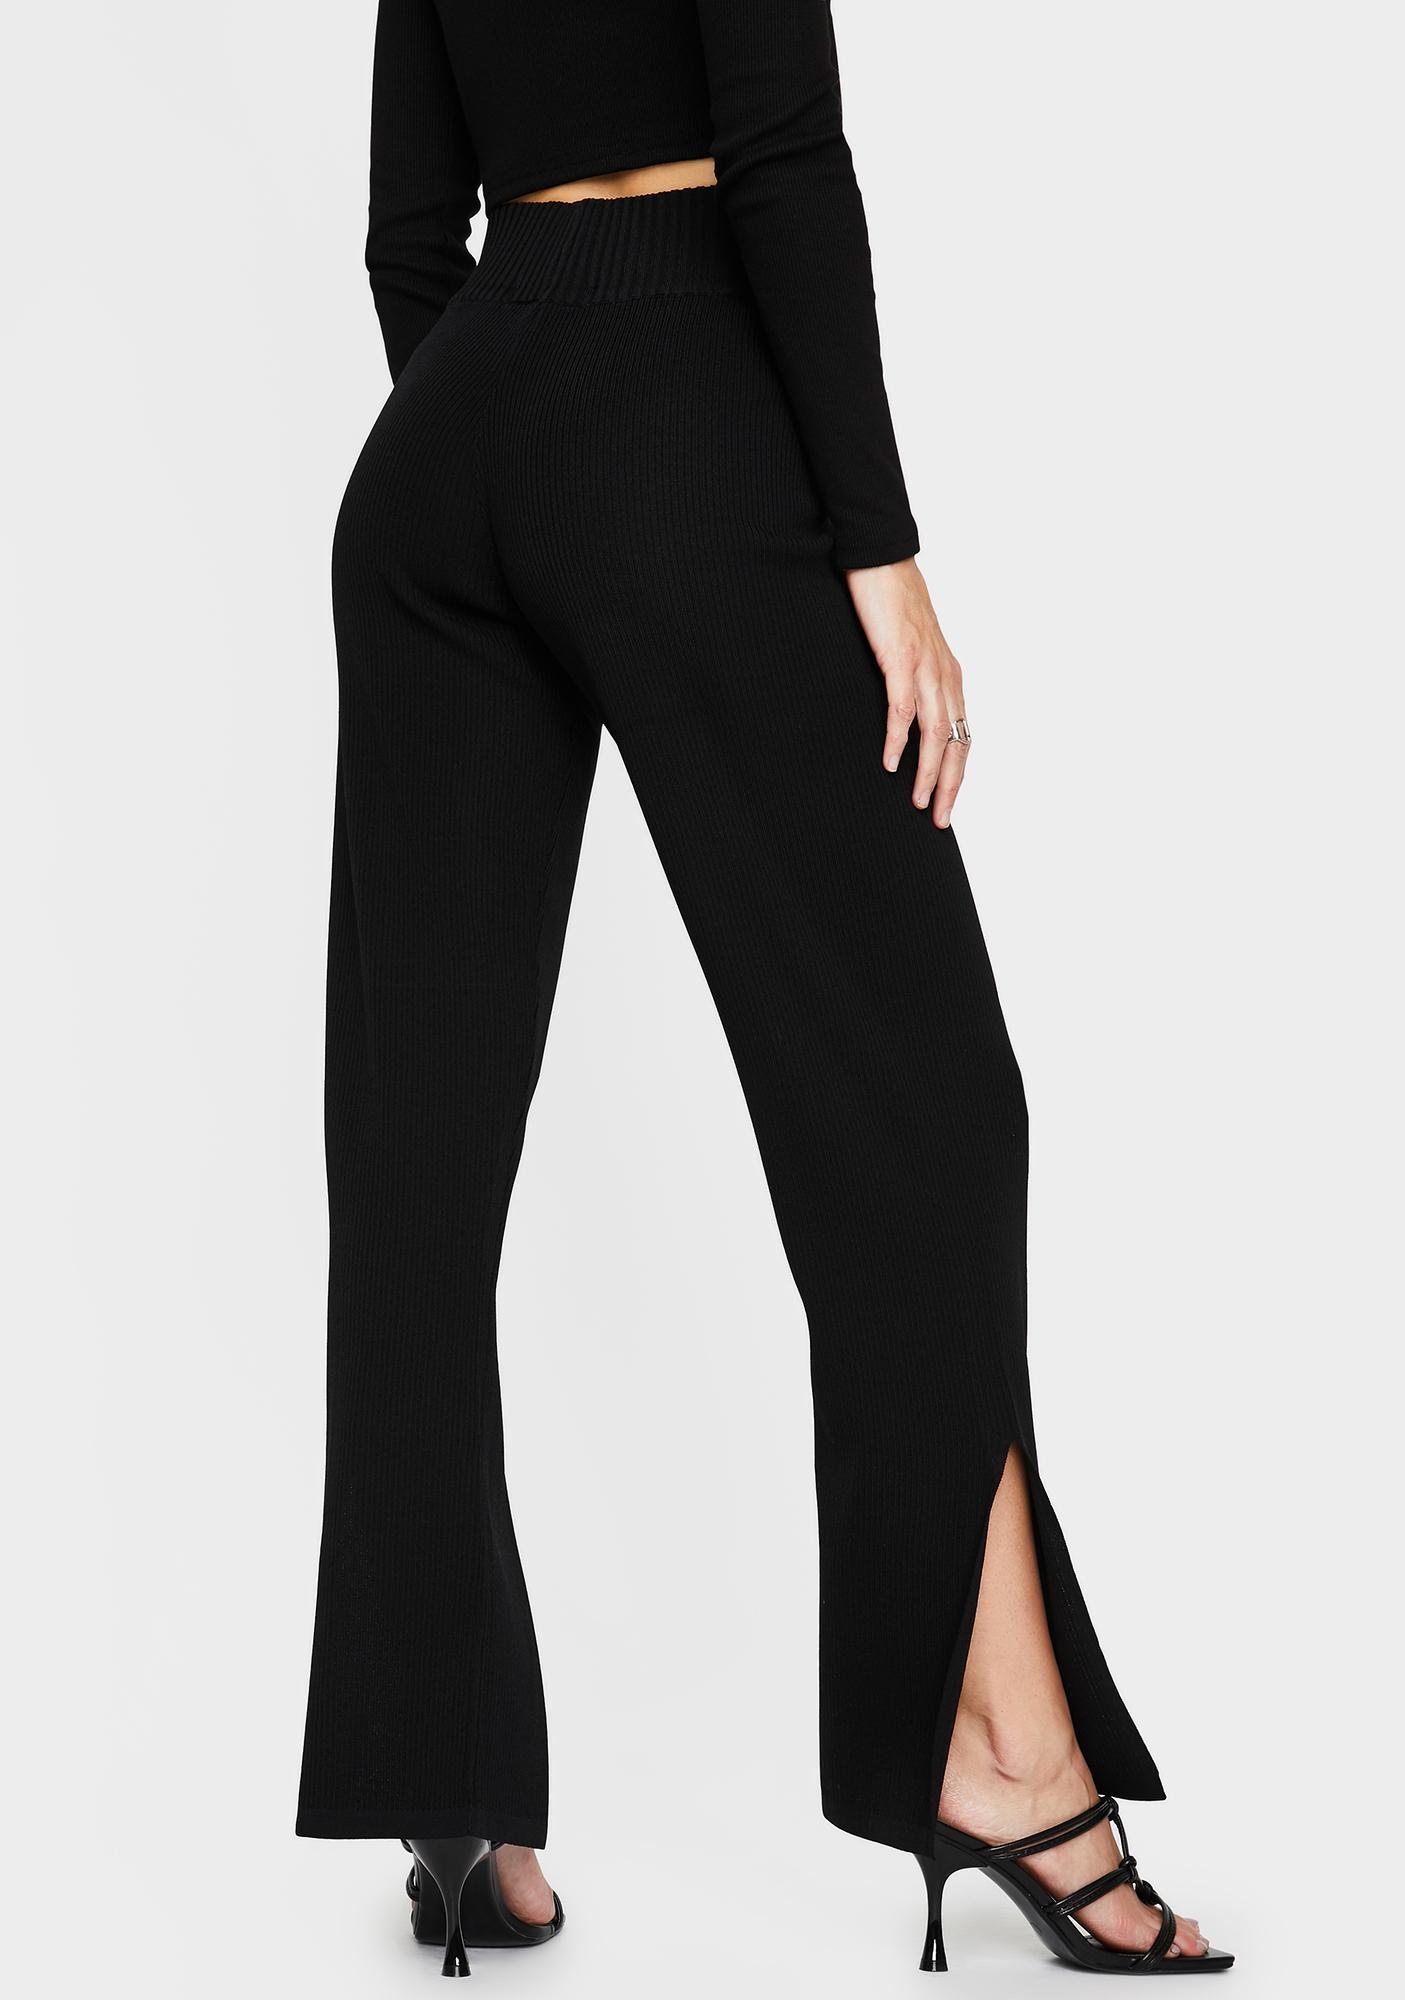 THE KRIPT Black Coya Knit Pants